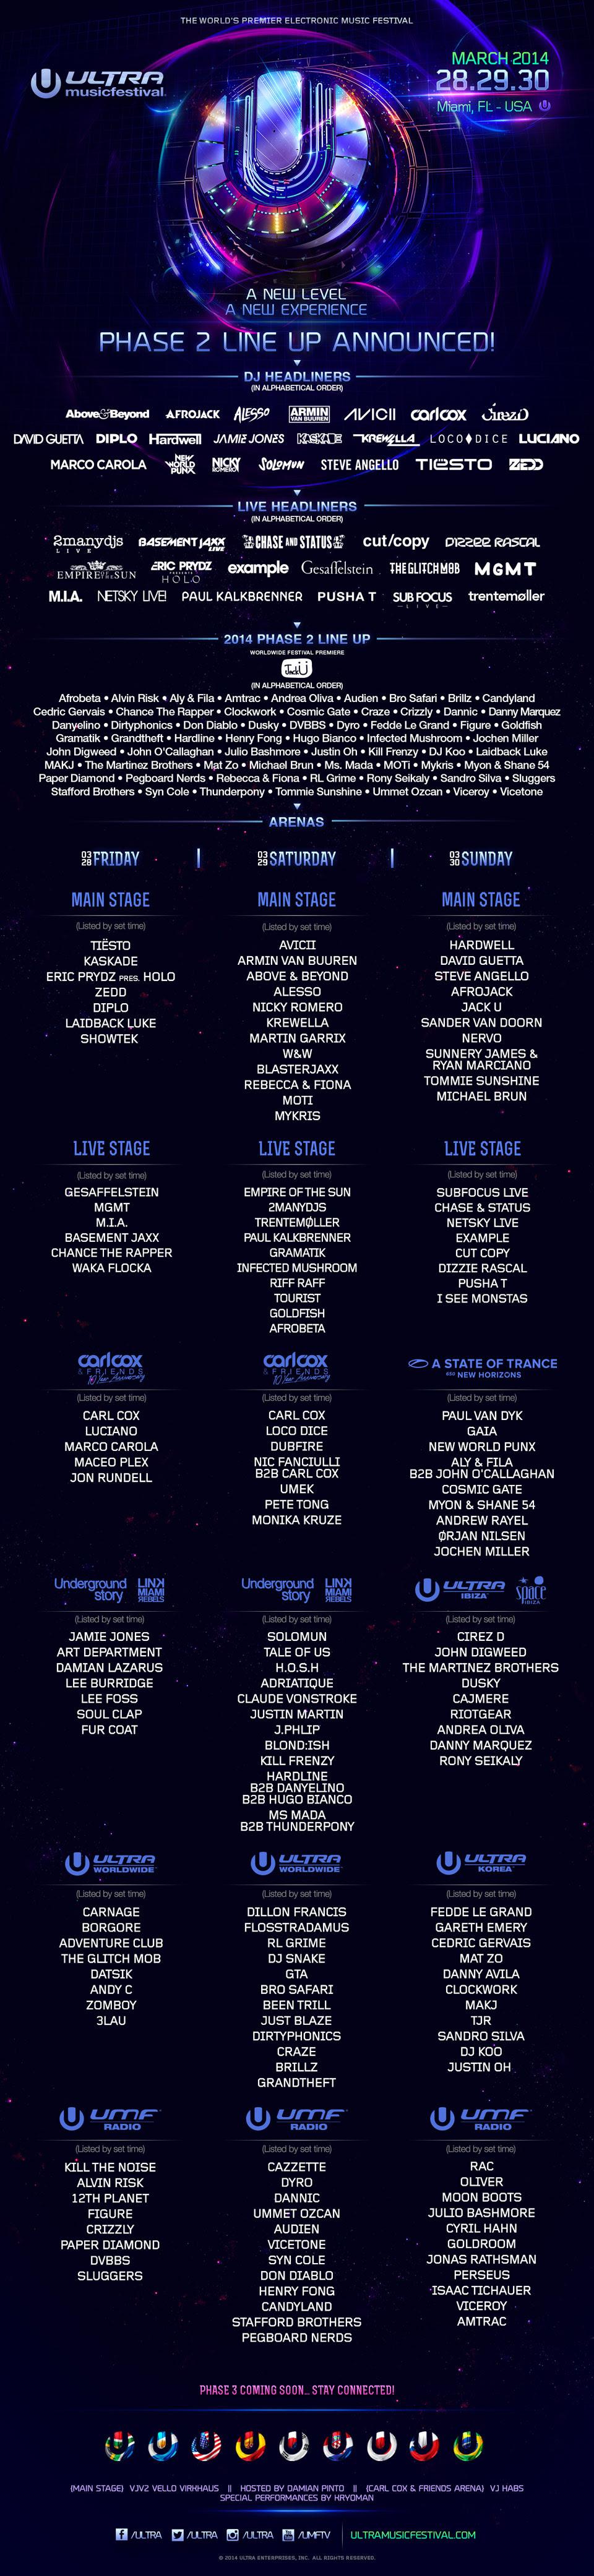 UltraMusicFestival2014-lineup2announced